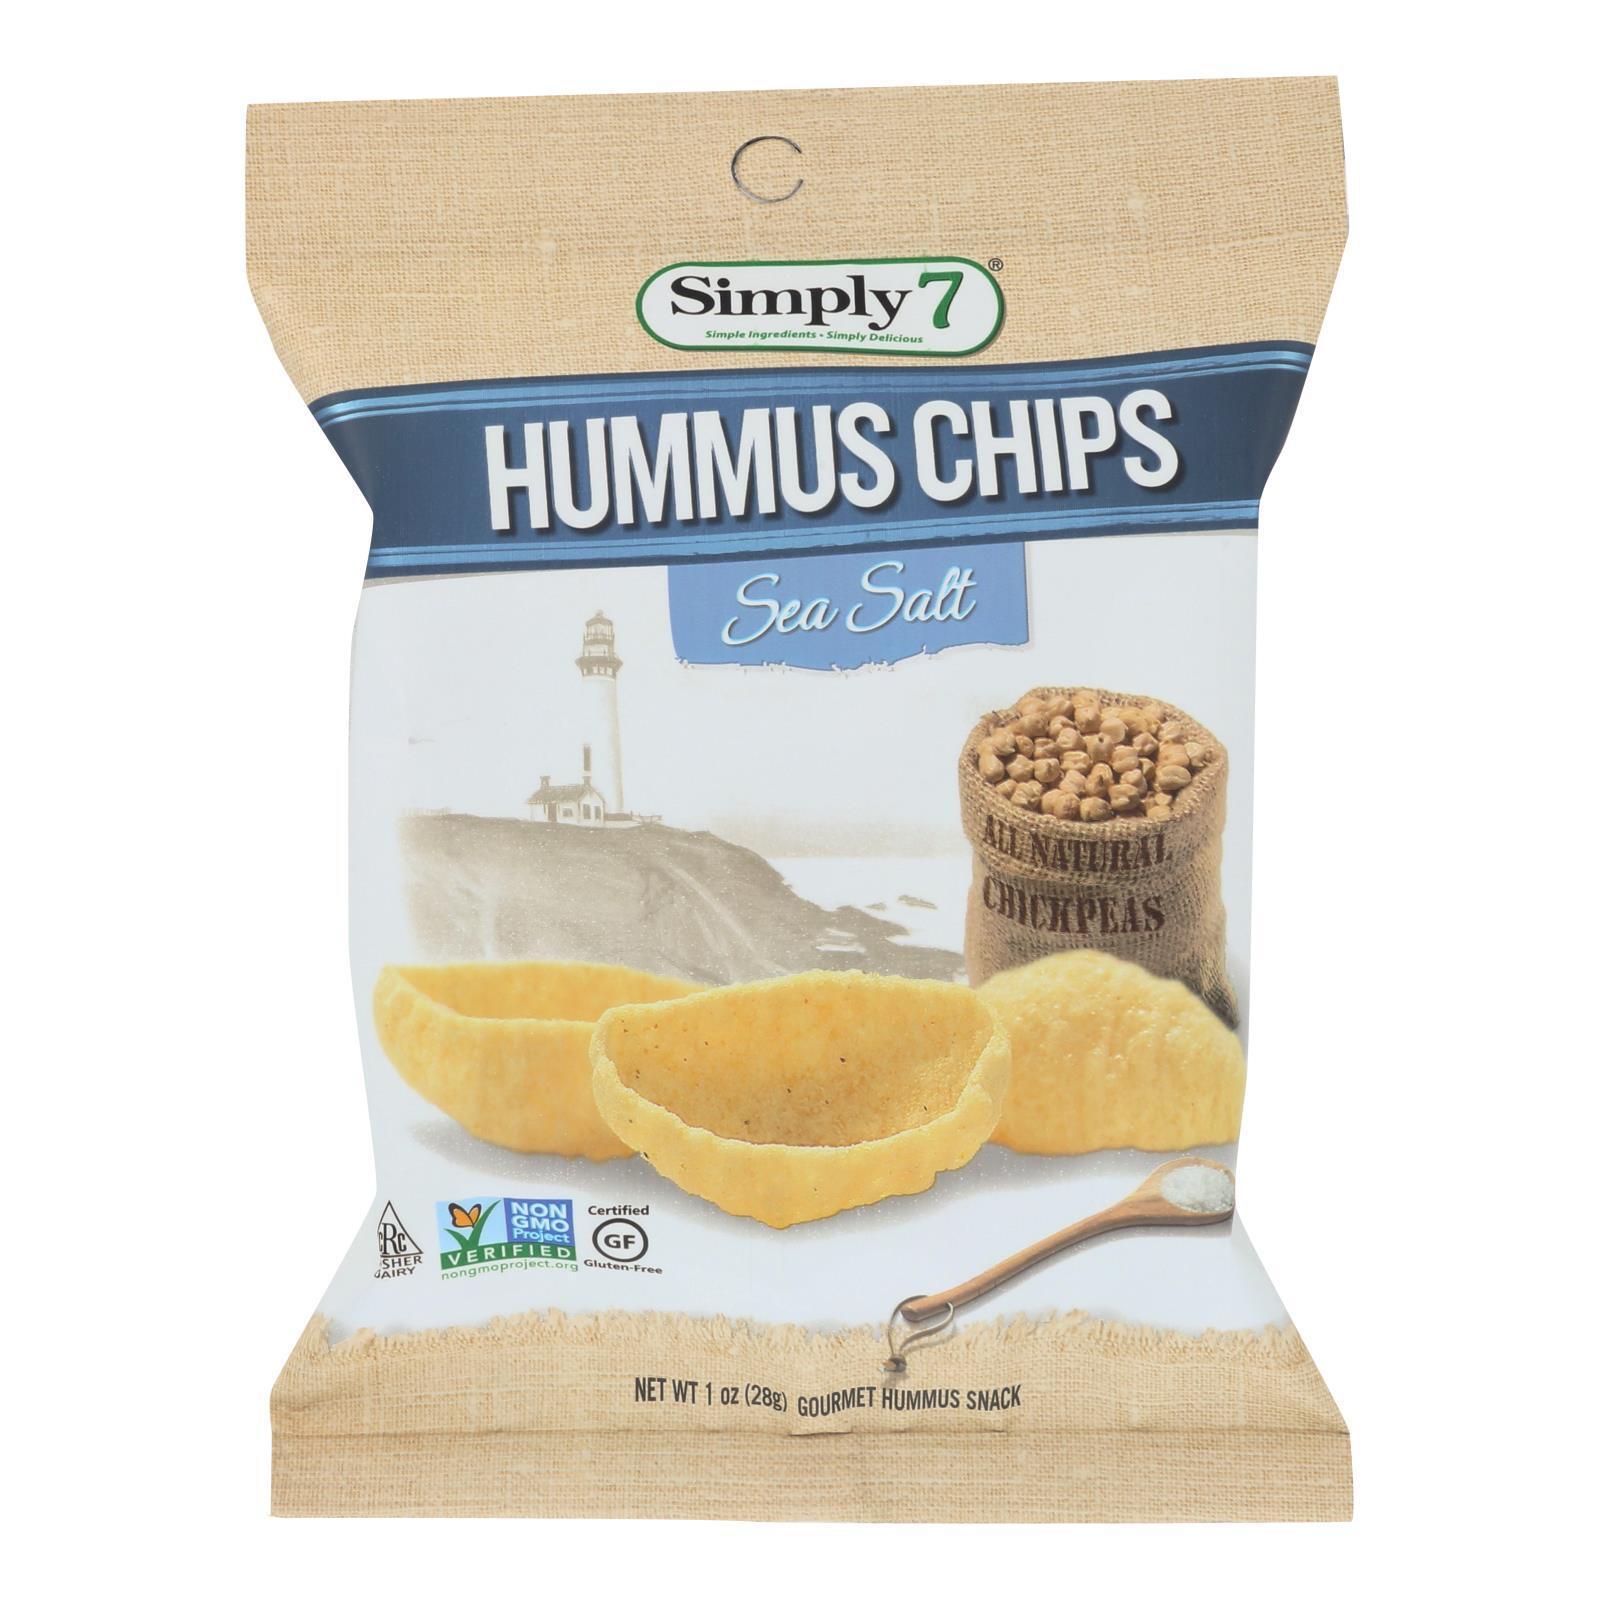 Simply 7 Hummus Chips - Sea Salt - Case of 24 - 1 oz.